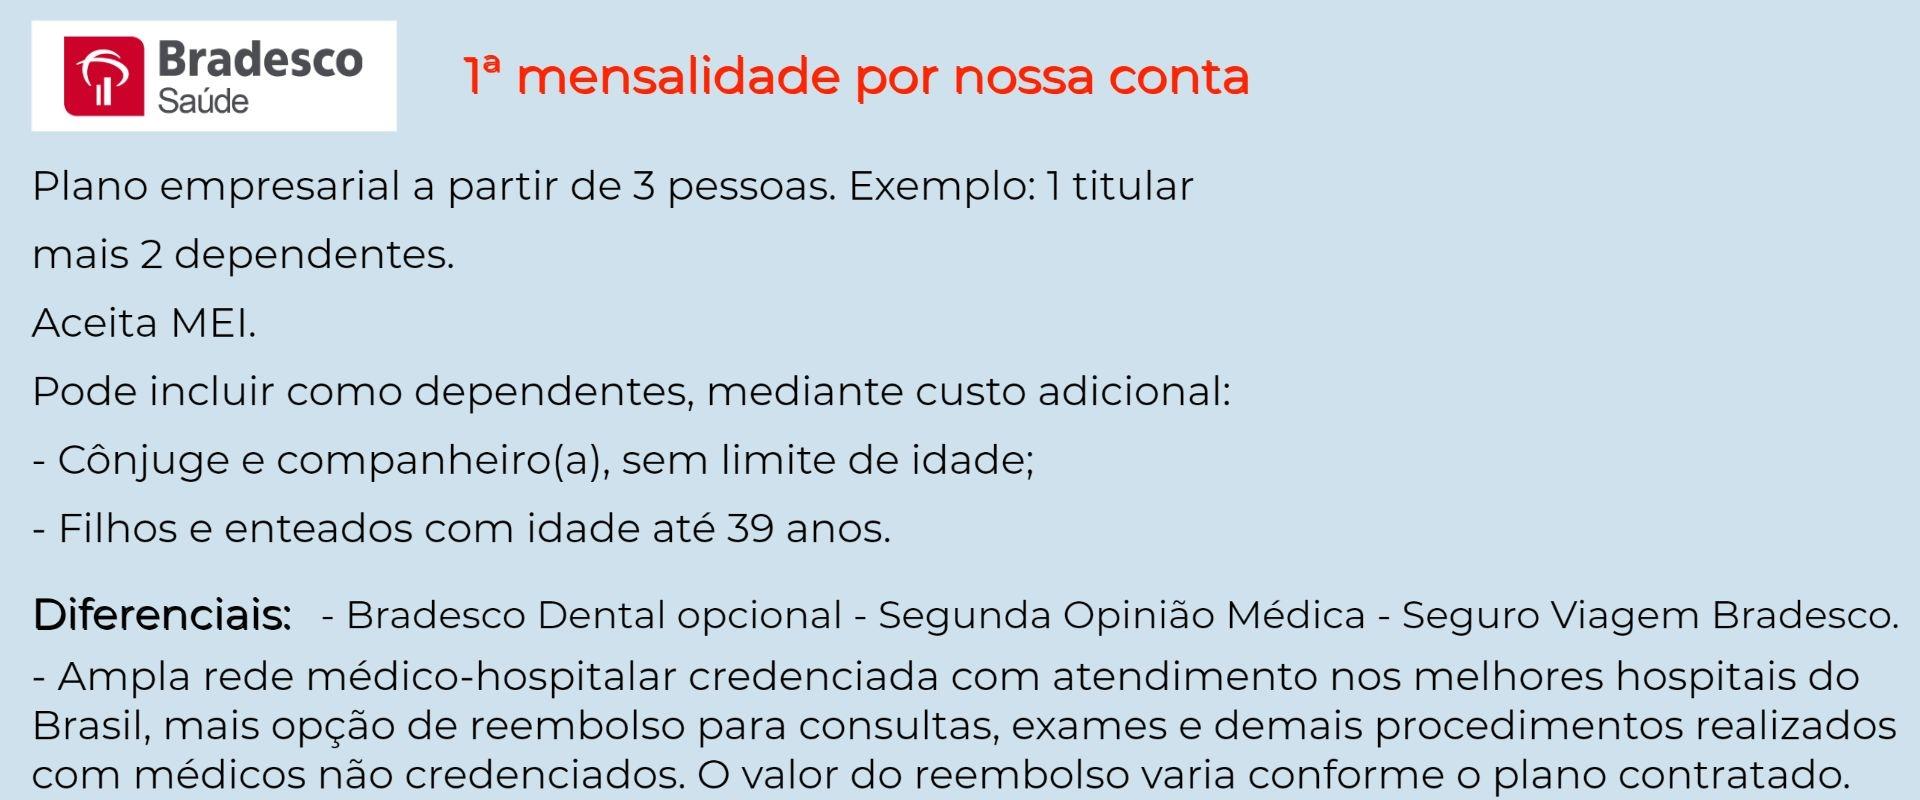 Bradesco Saúde Empresarial - Itamaraju